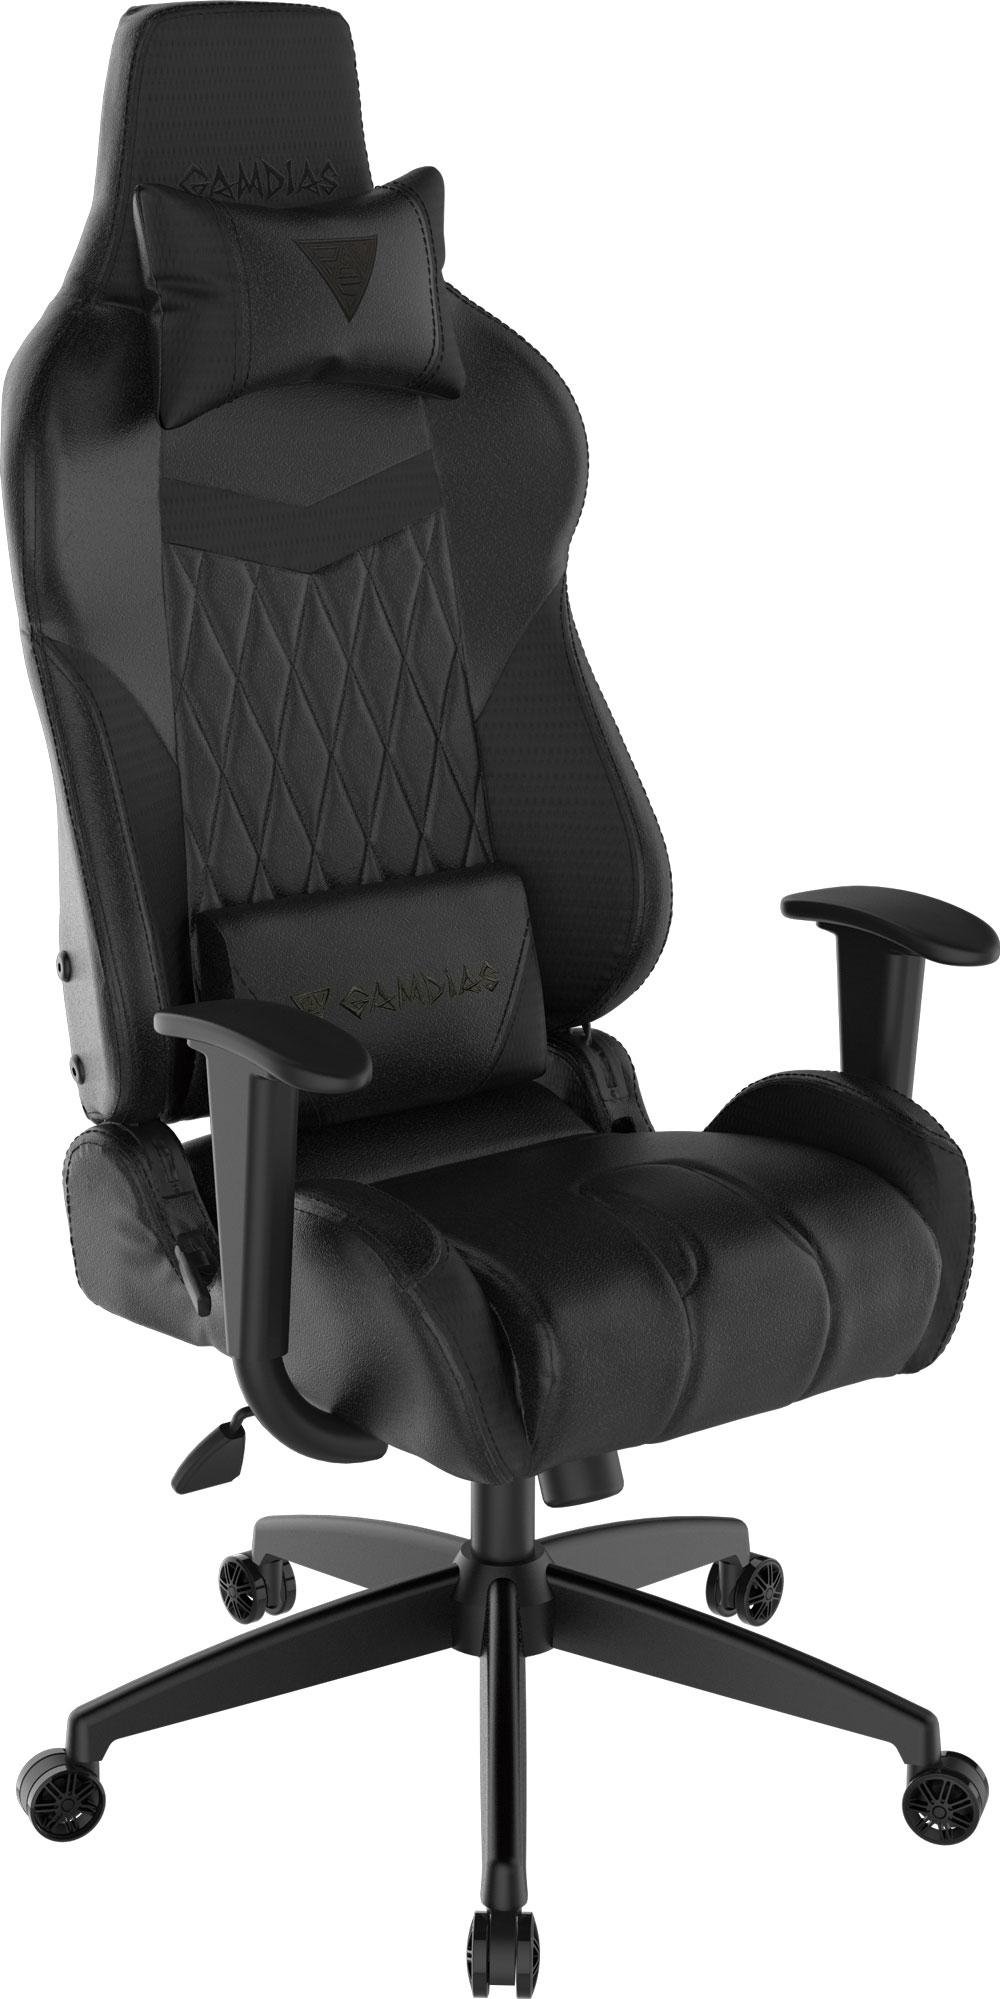 Gamdias Achilles E2 Gaming Chair - Black